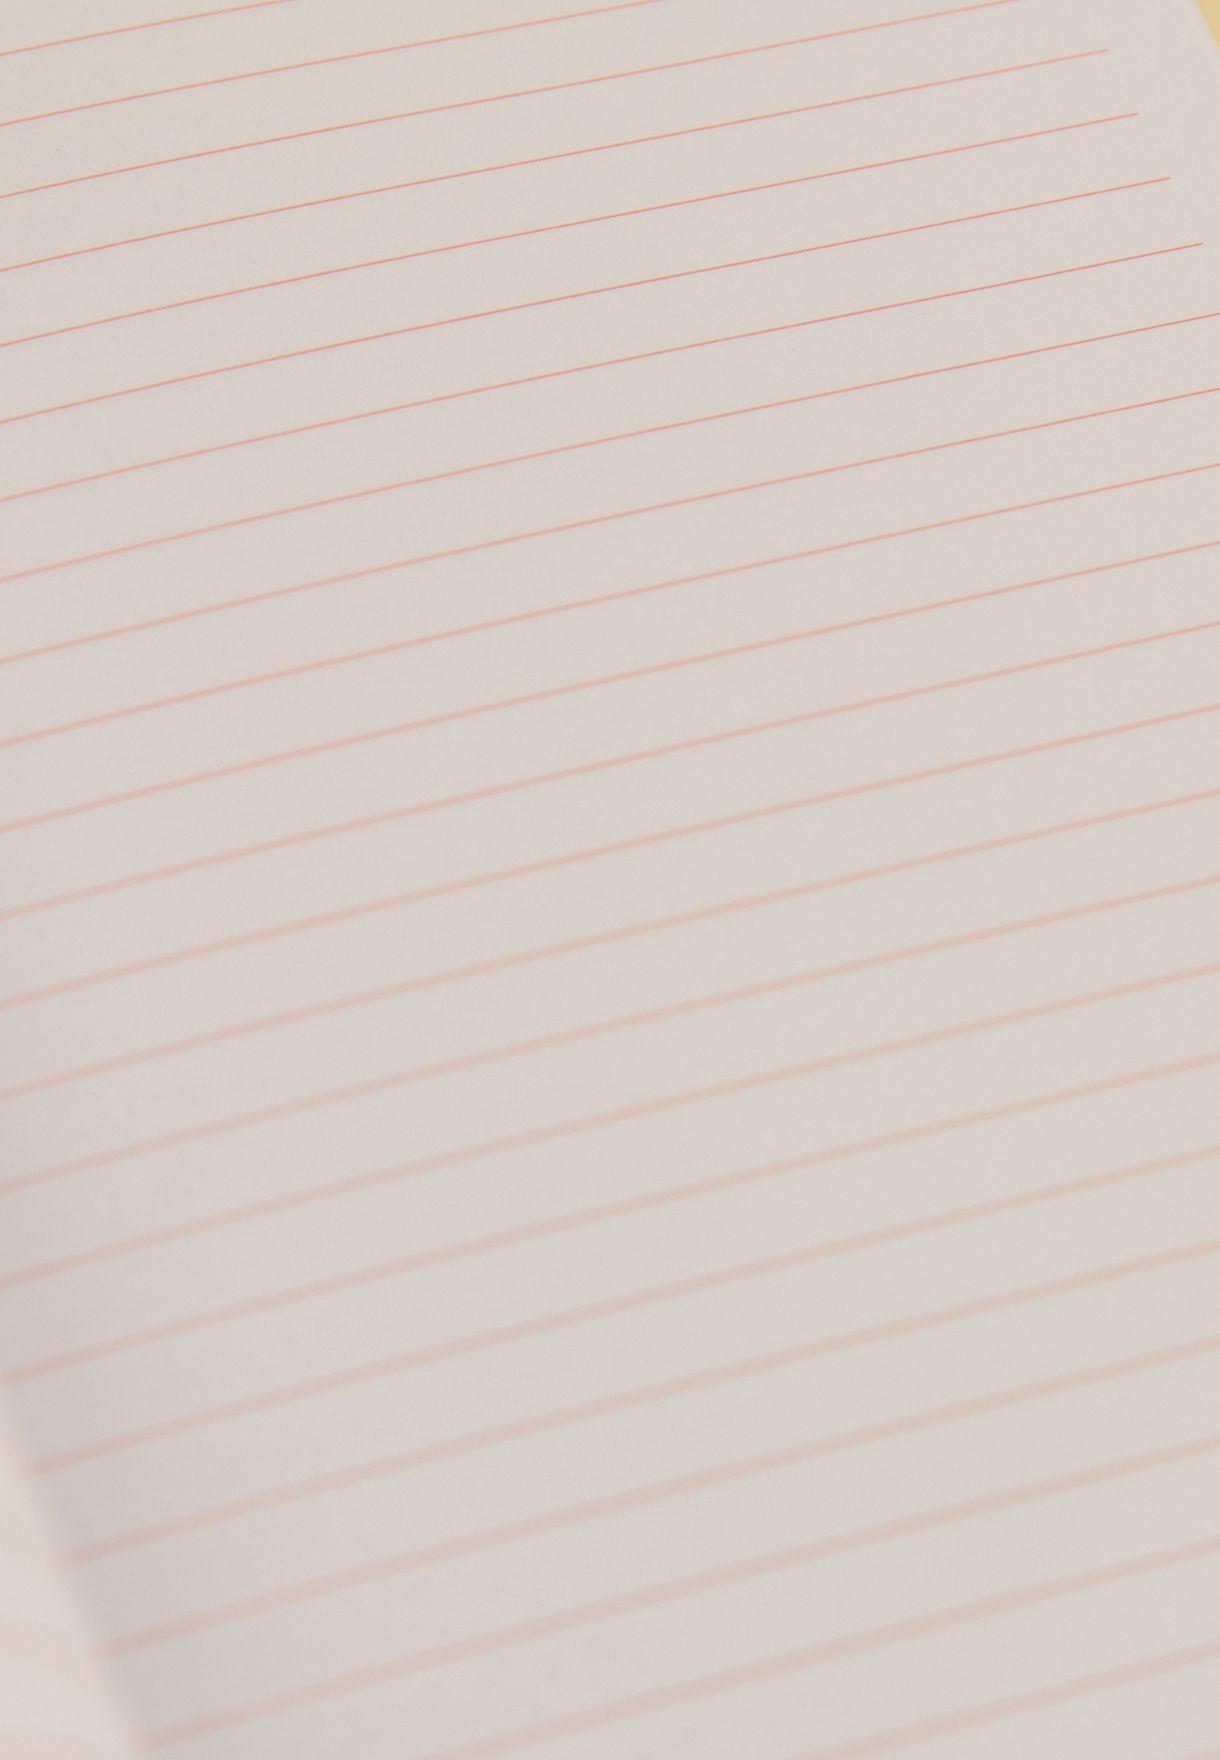 دفتر يوميات واقلام حبر